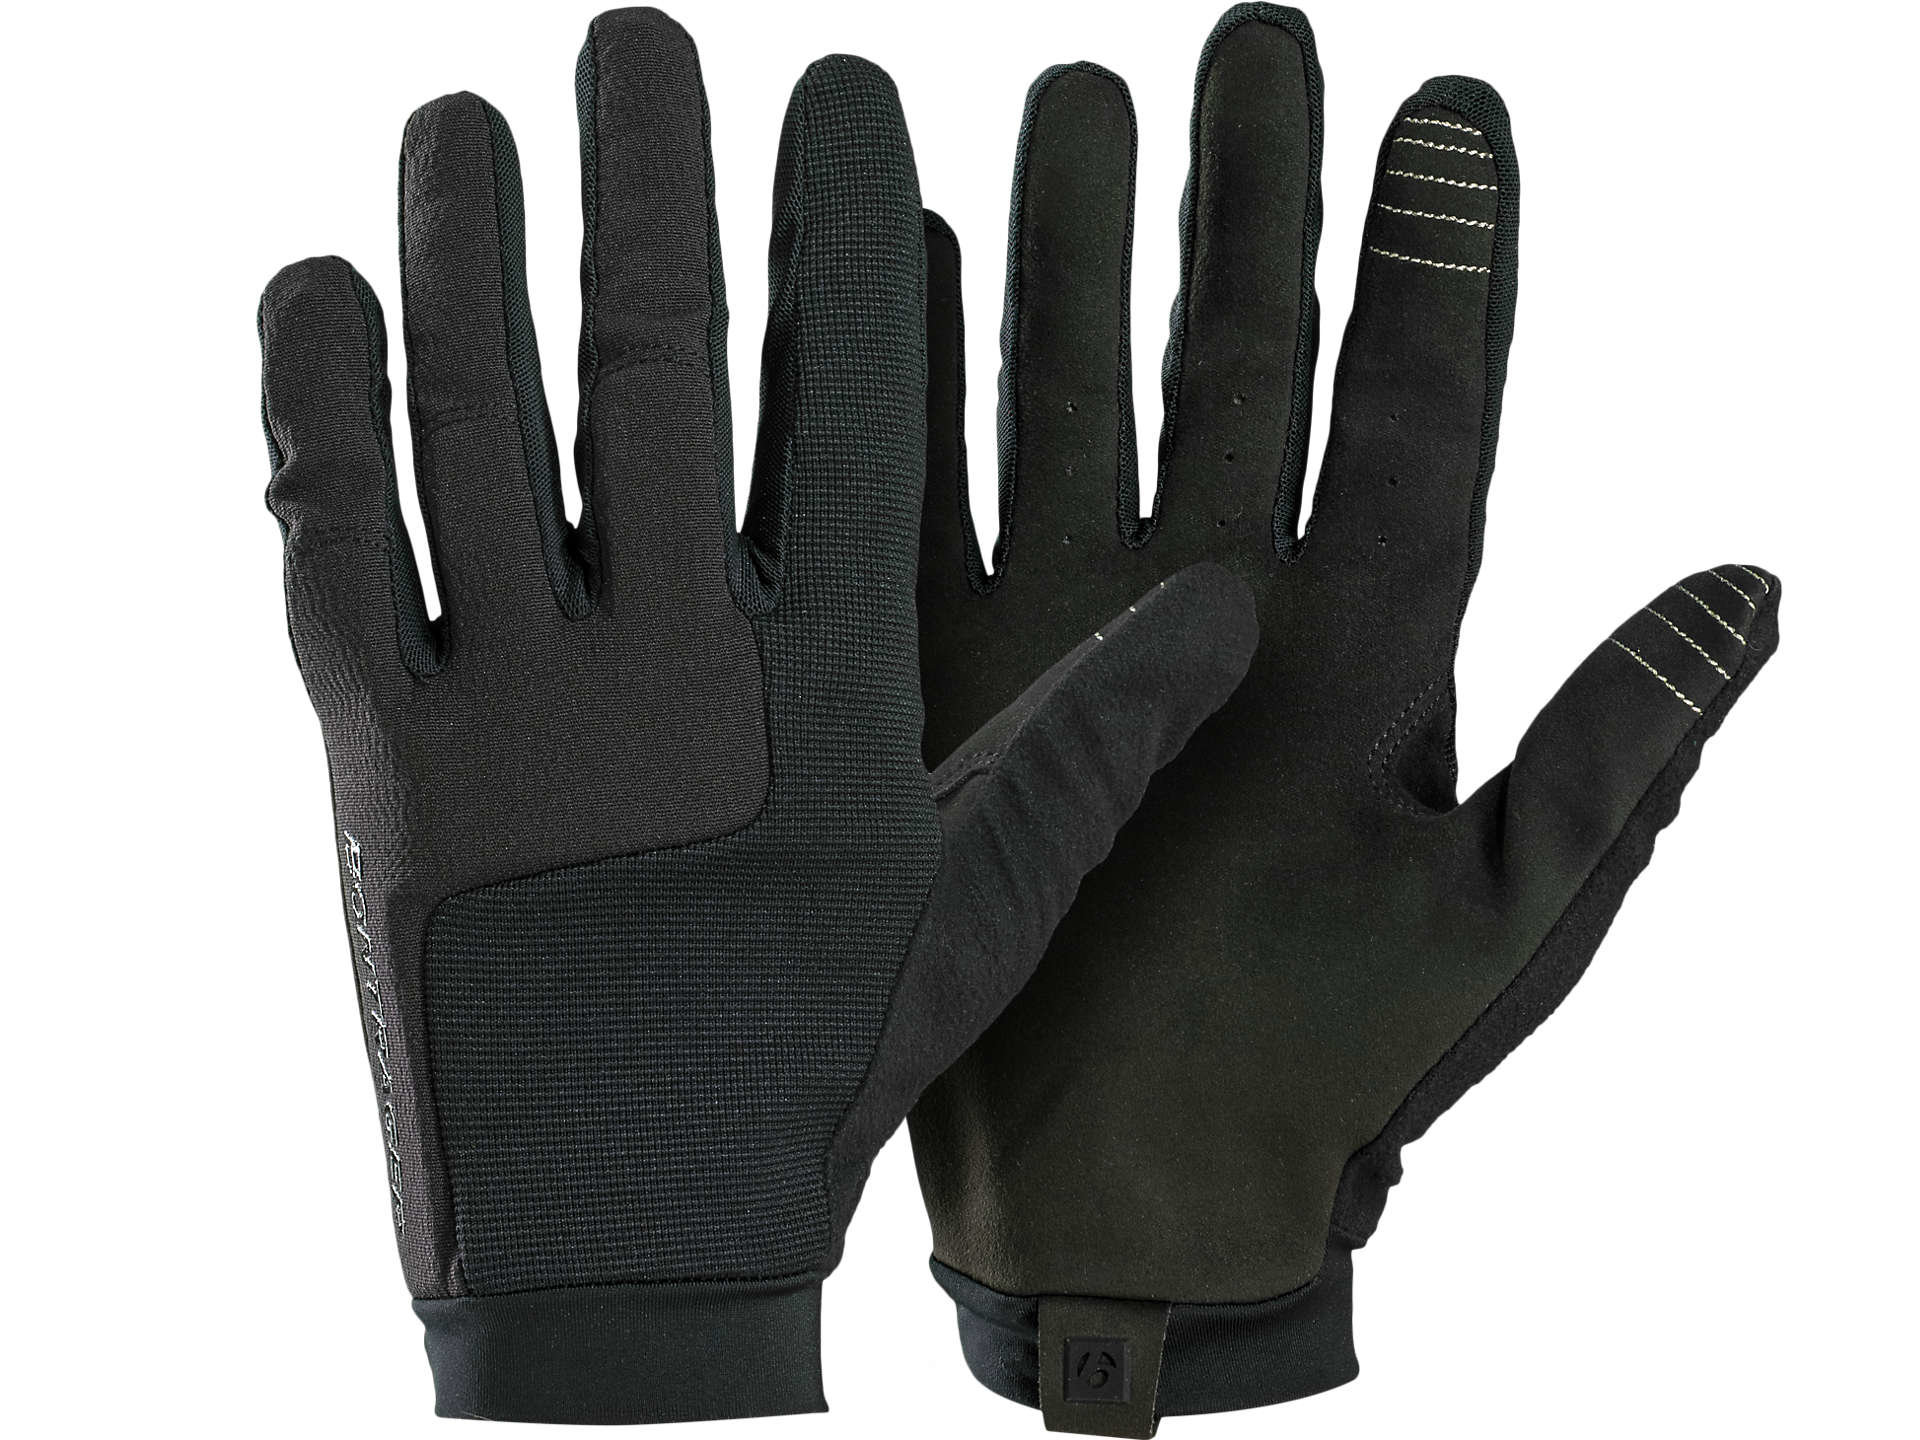 Womens Mountain Glove